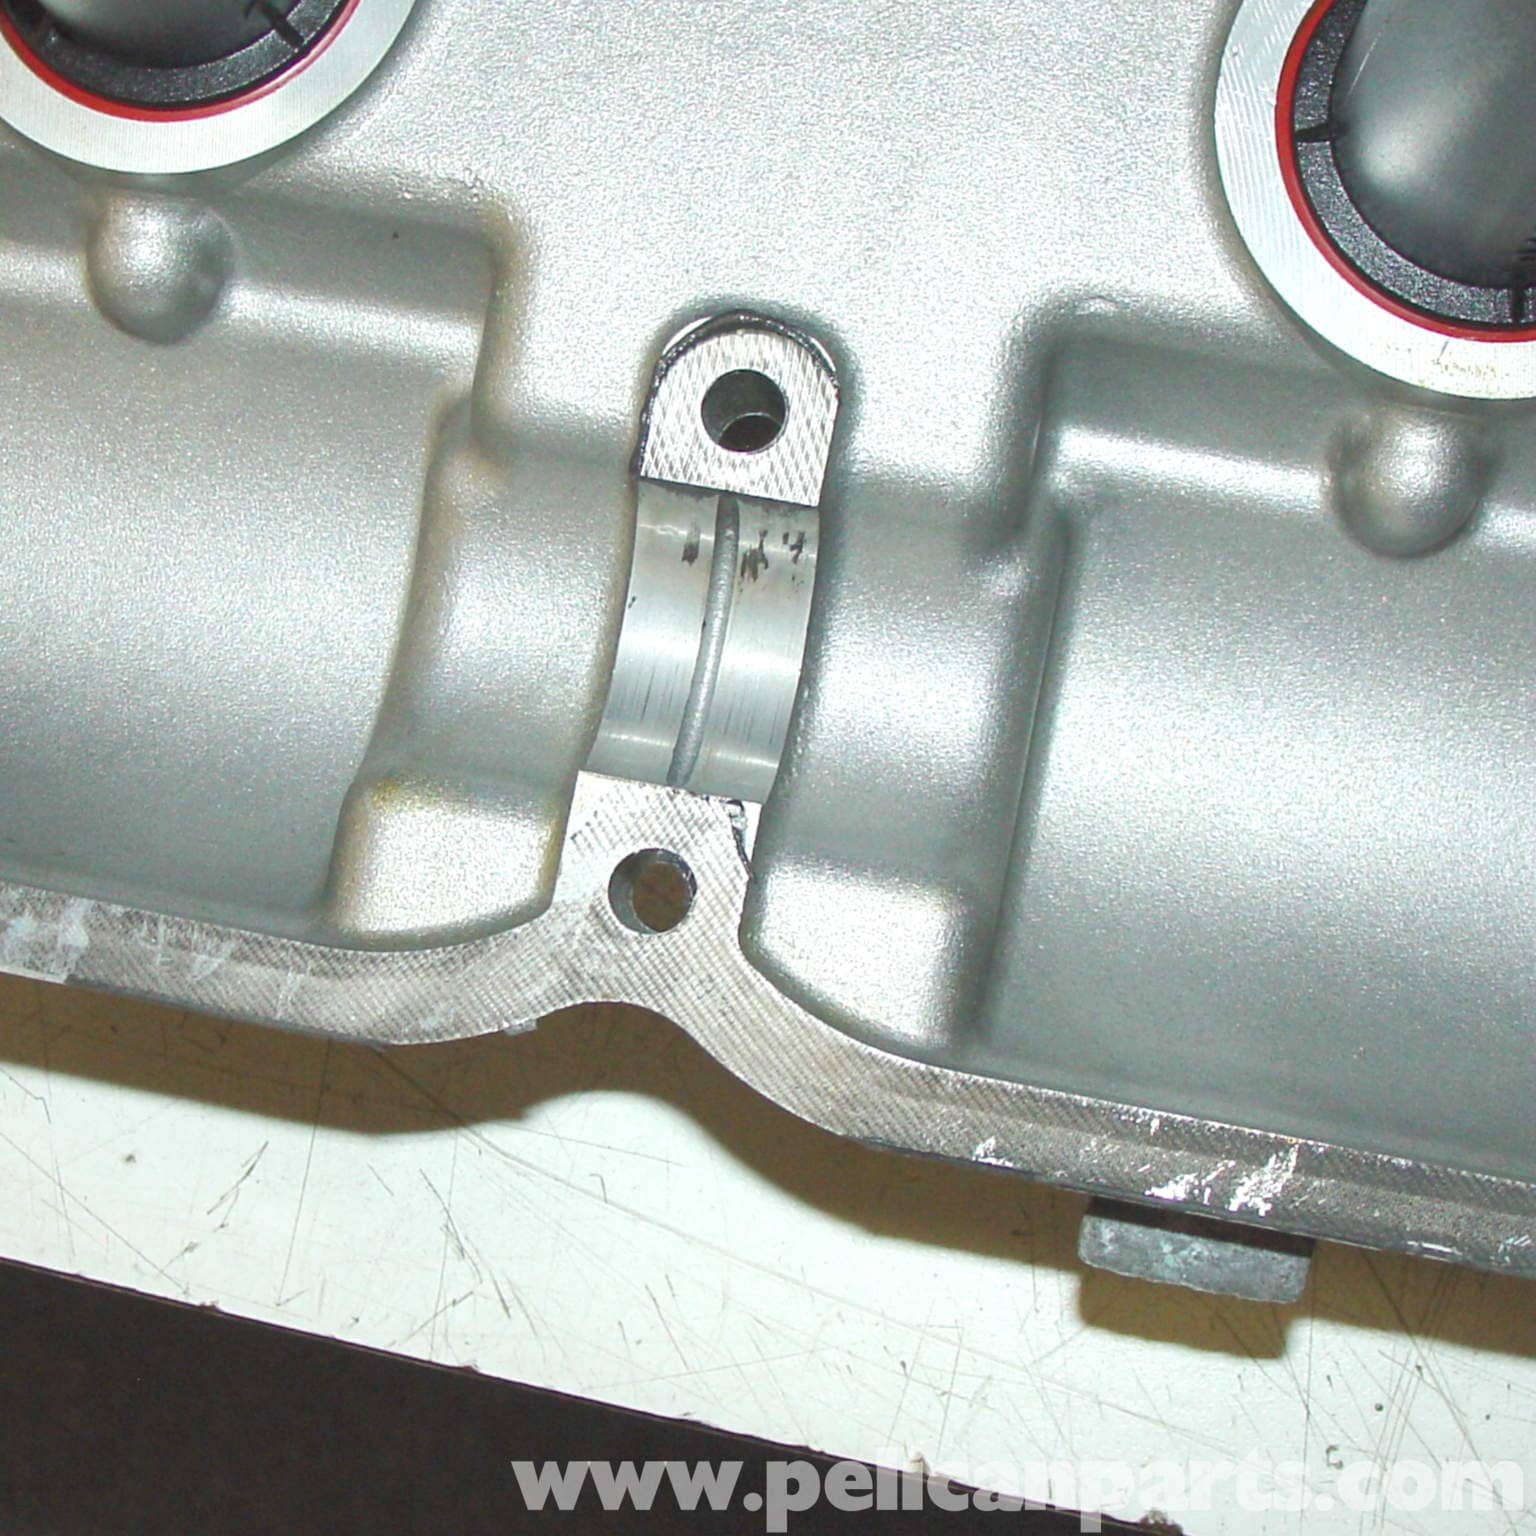 Porsche 996 Engine Number Location: Porsche 911 Carrera Camshaft Swap And Valve Train Repair